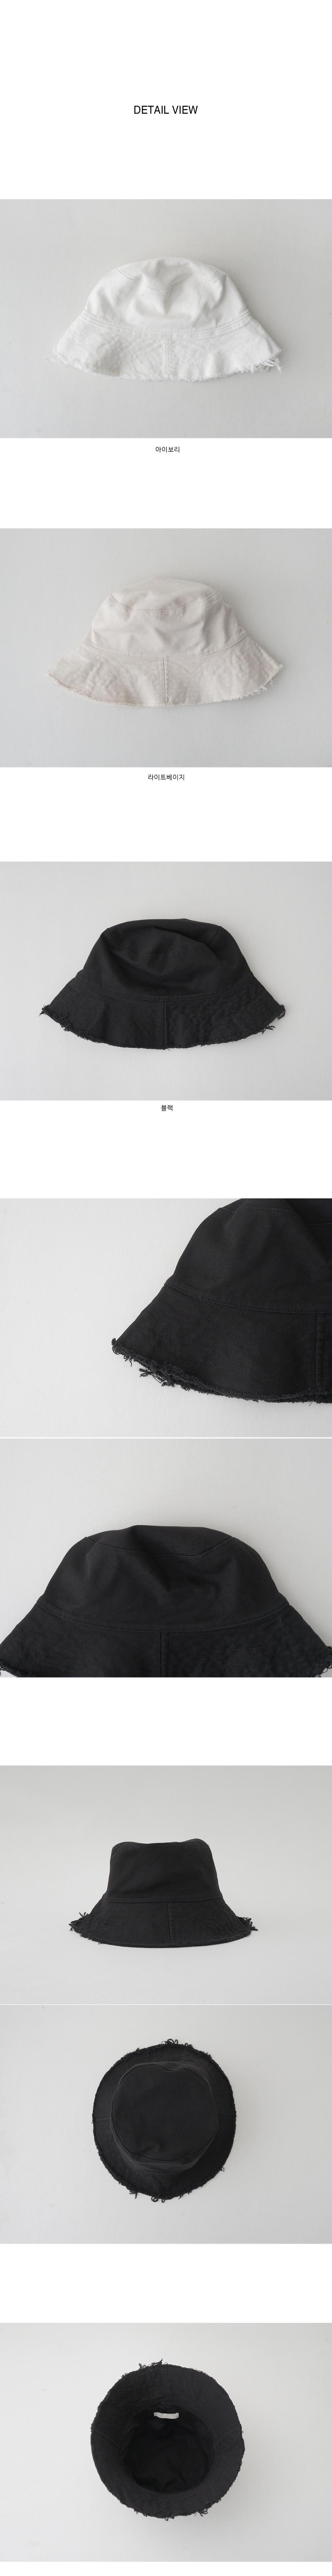 cut-off bucket hat